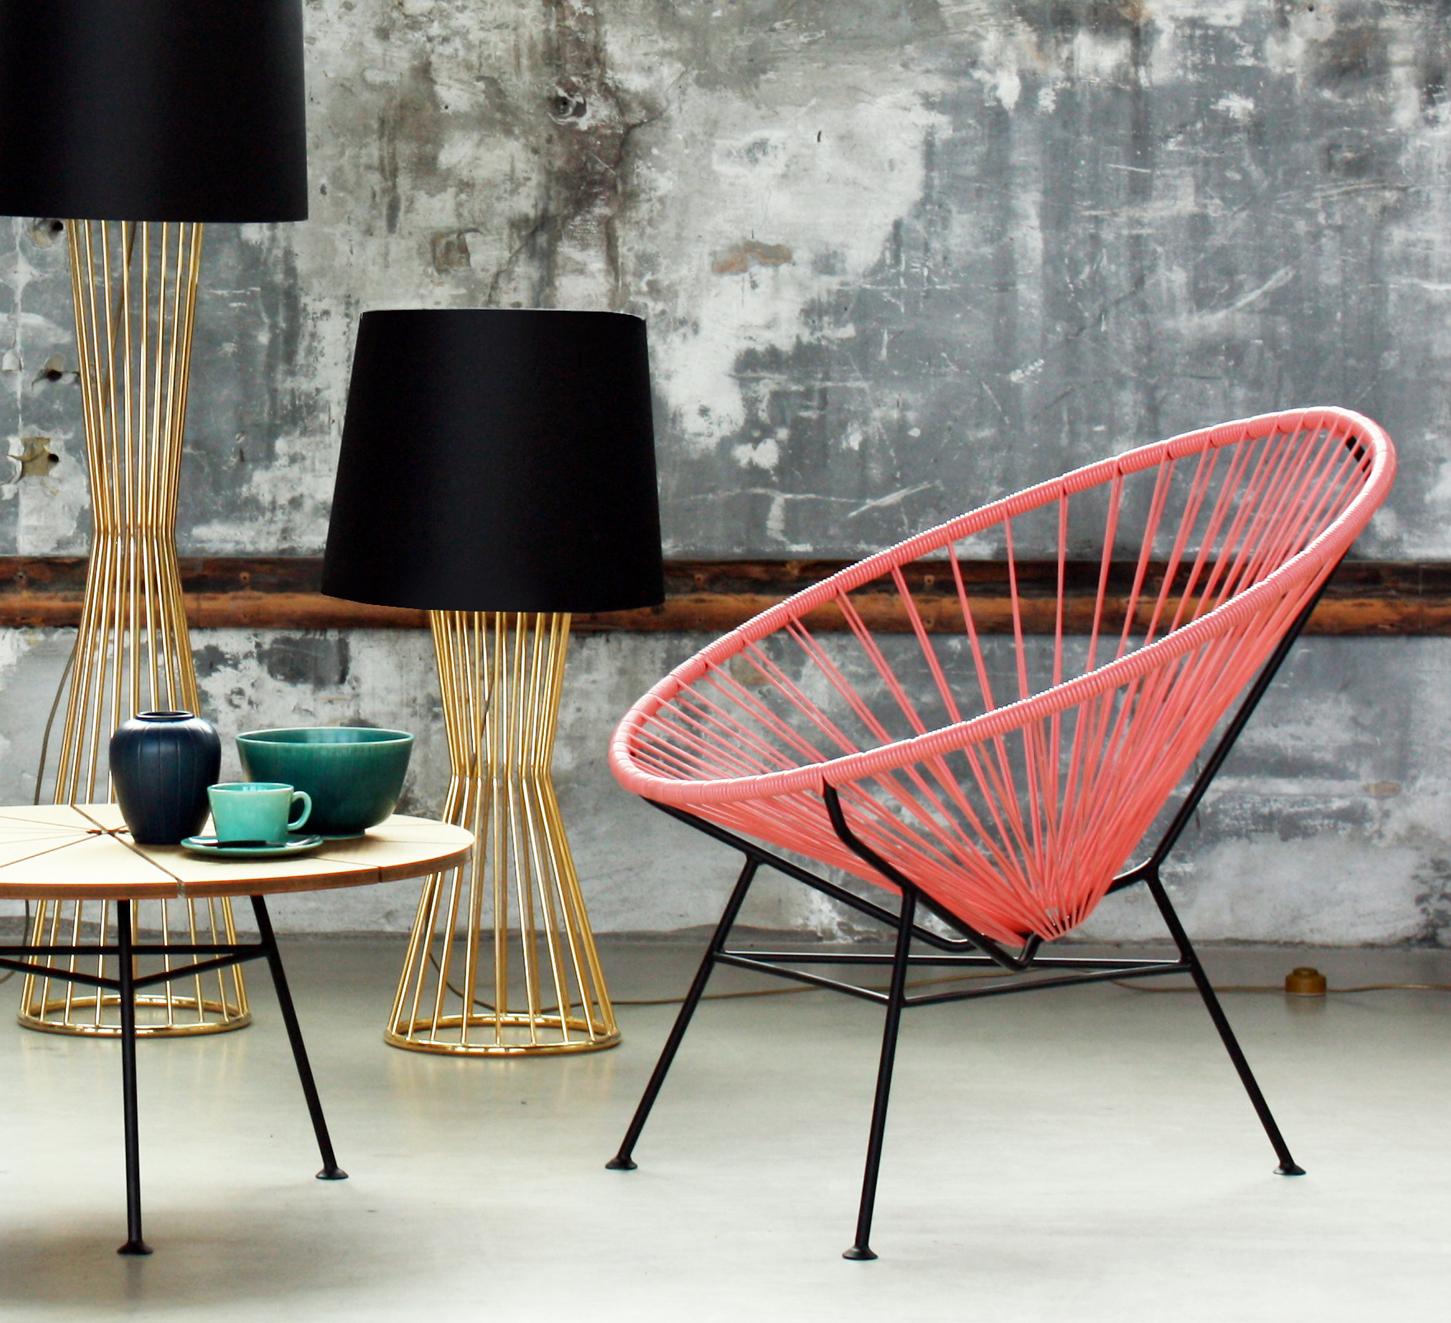 marzo silla acapulco the deco soul. Black Bedroom Furniture Sets. Home Design Ideas